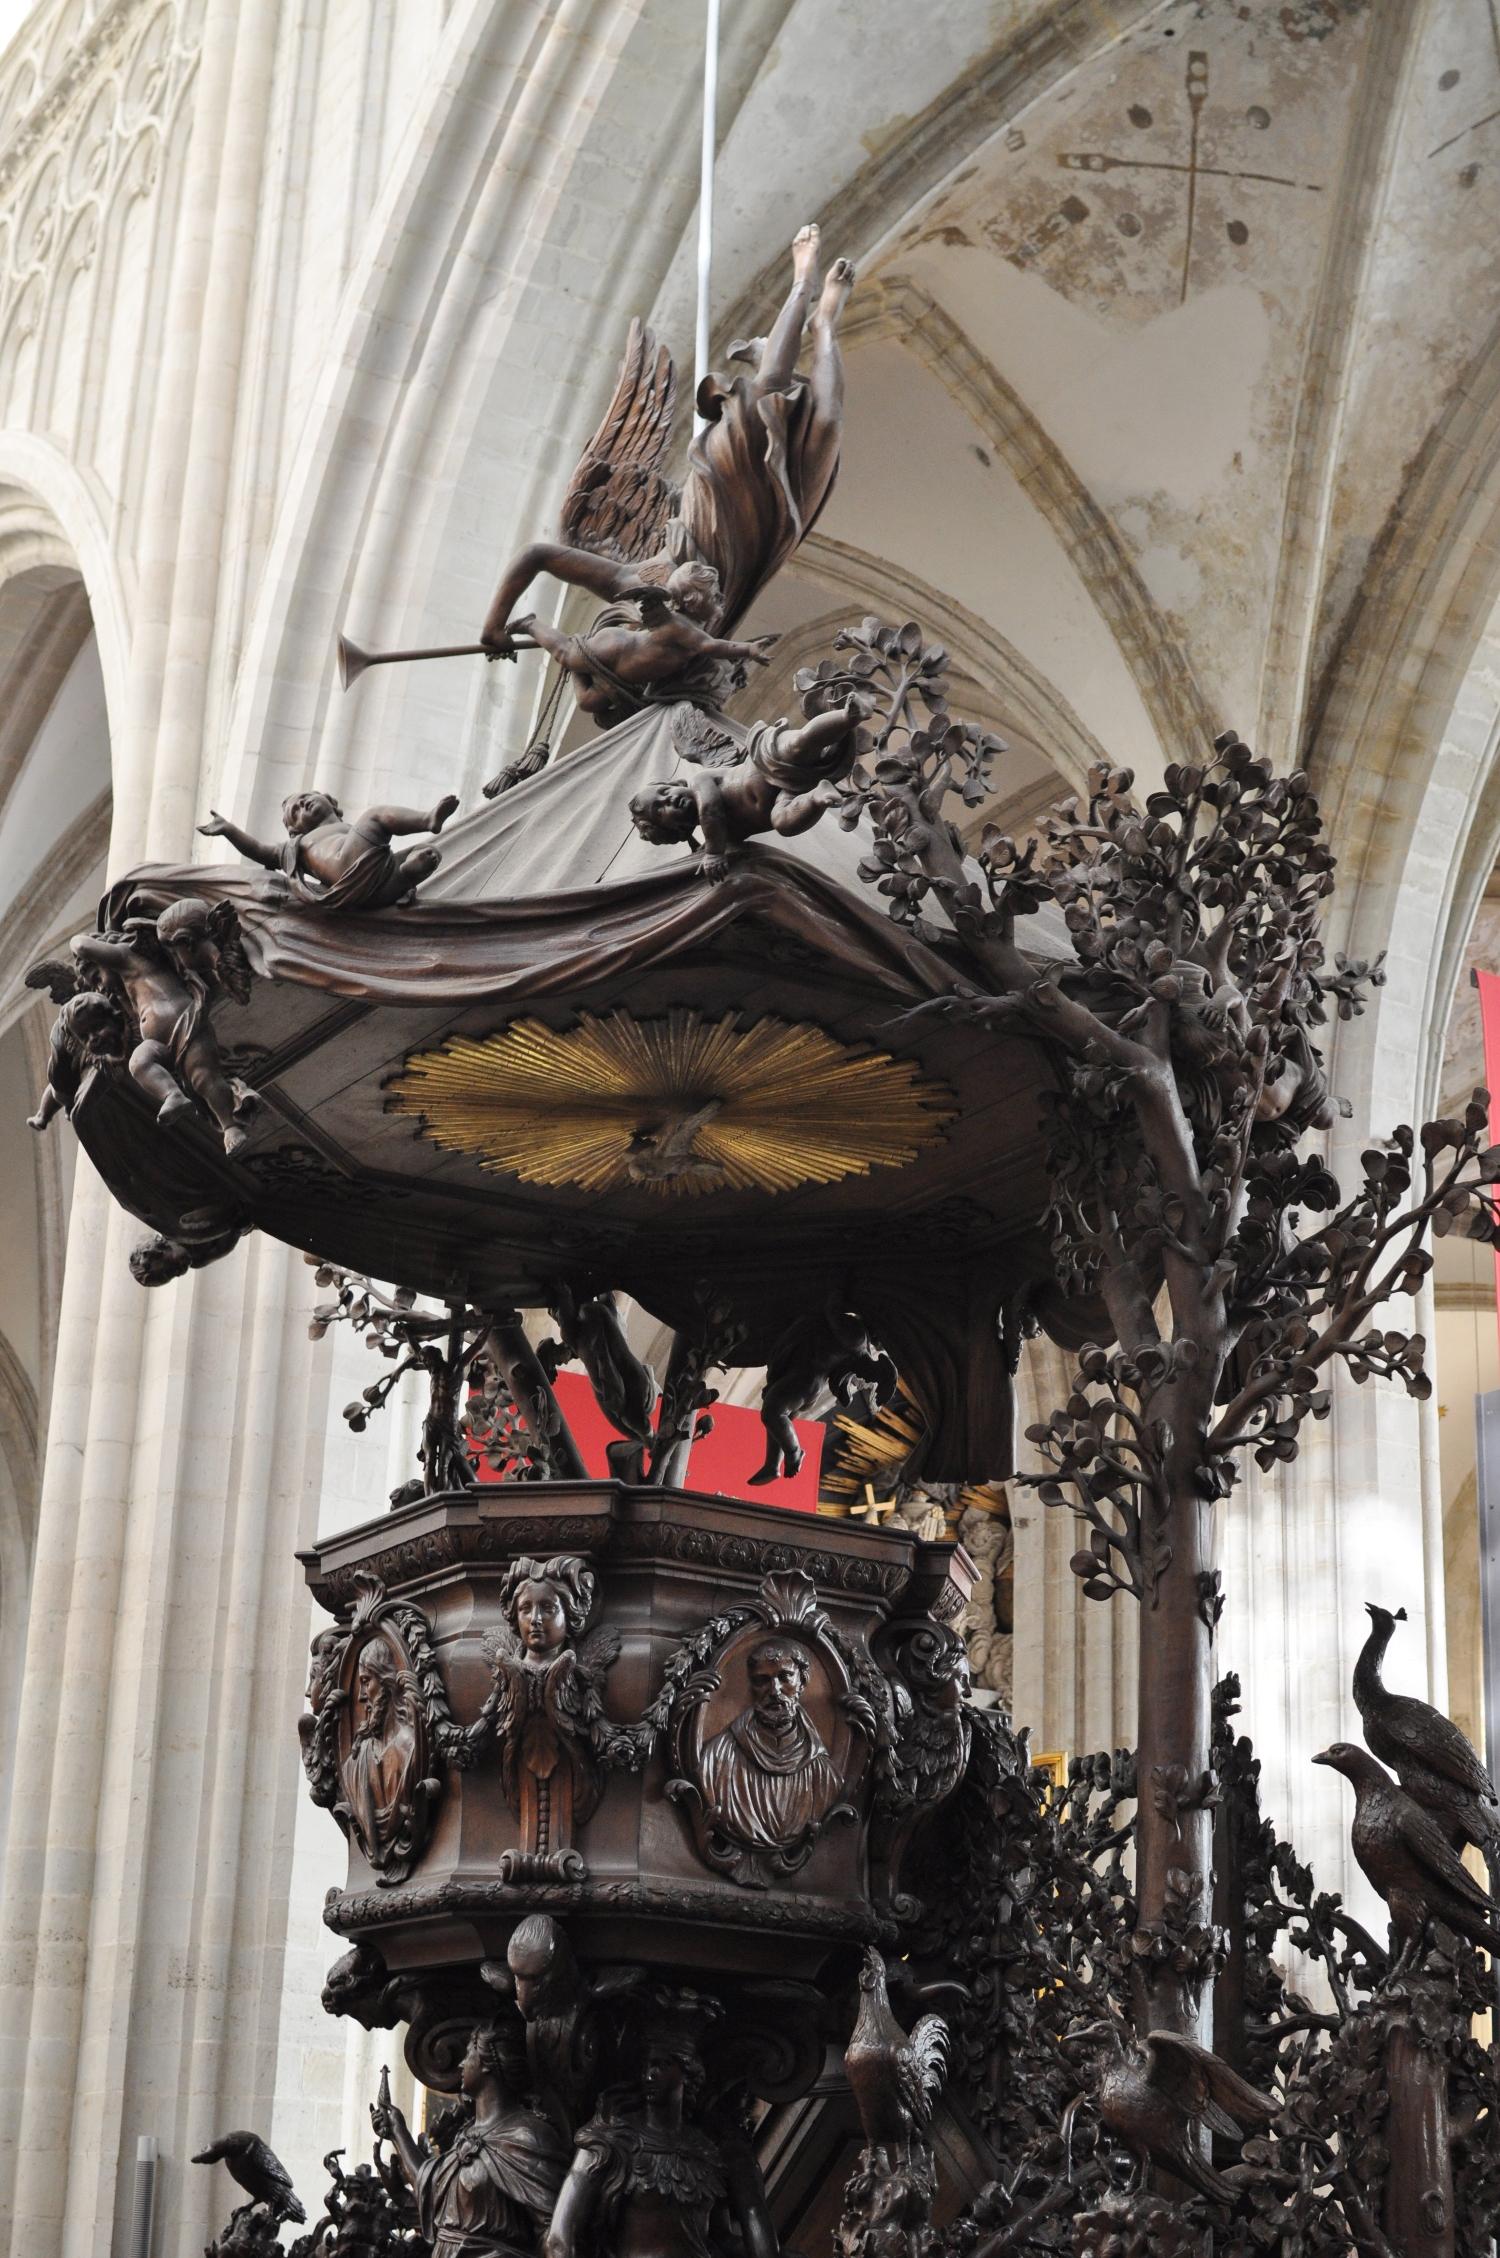 rocaille-blog-cattedrale-anversa-rubens-Onze-Lieve-Vrouwekathedraal-antwerpen-3